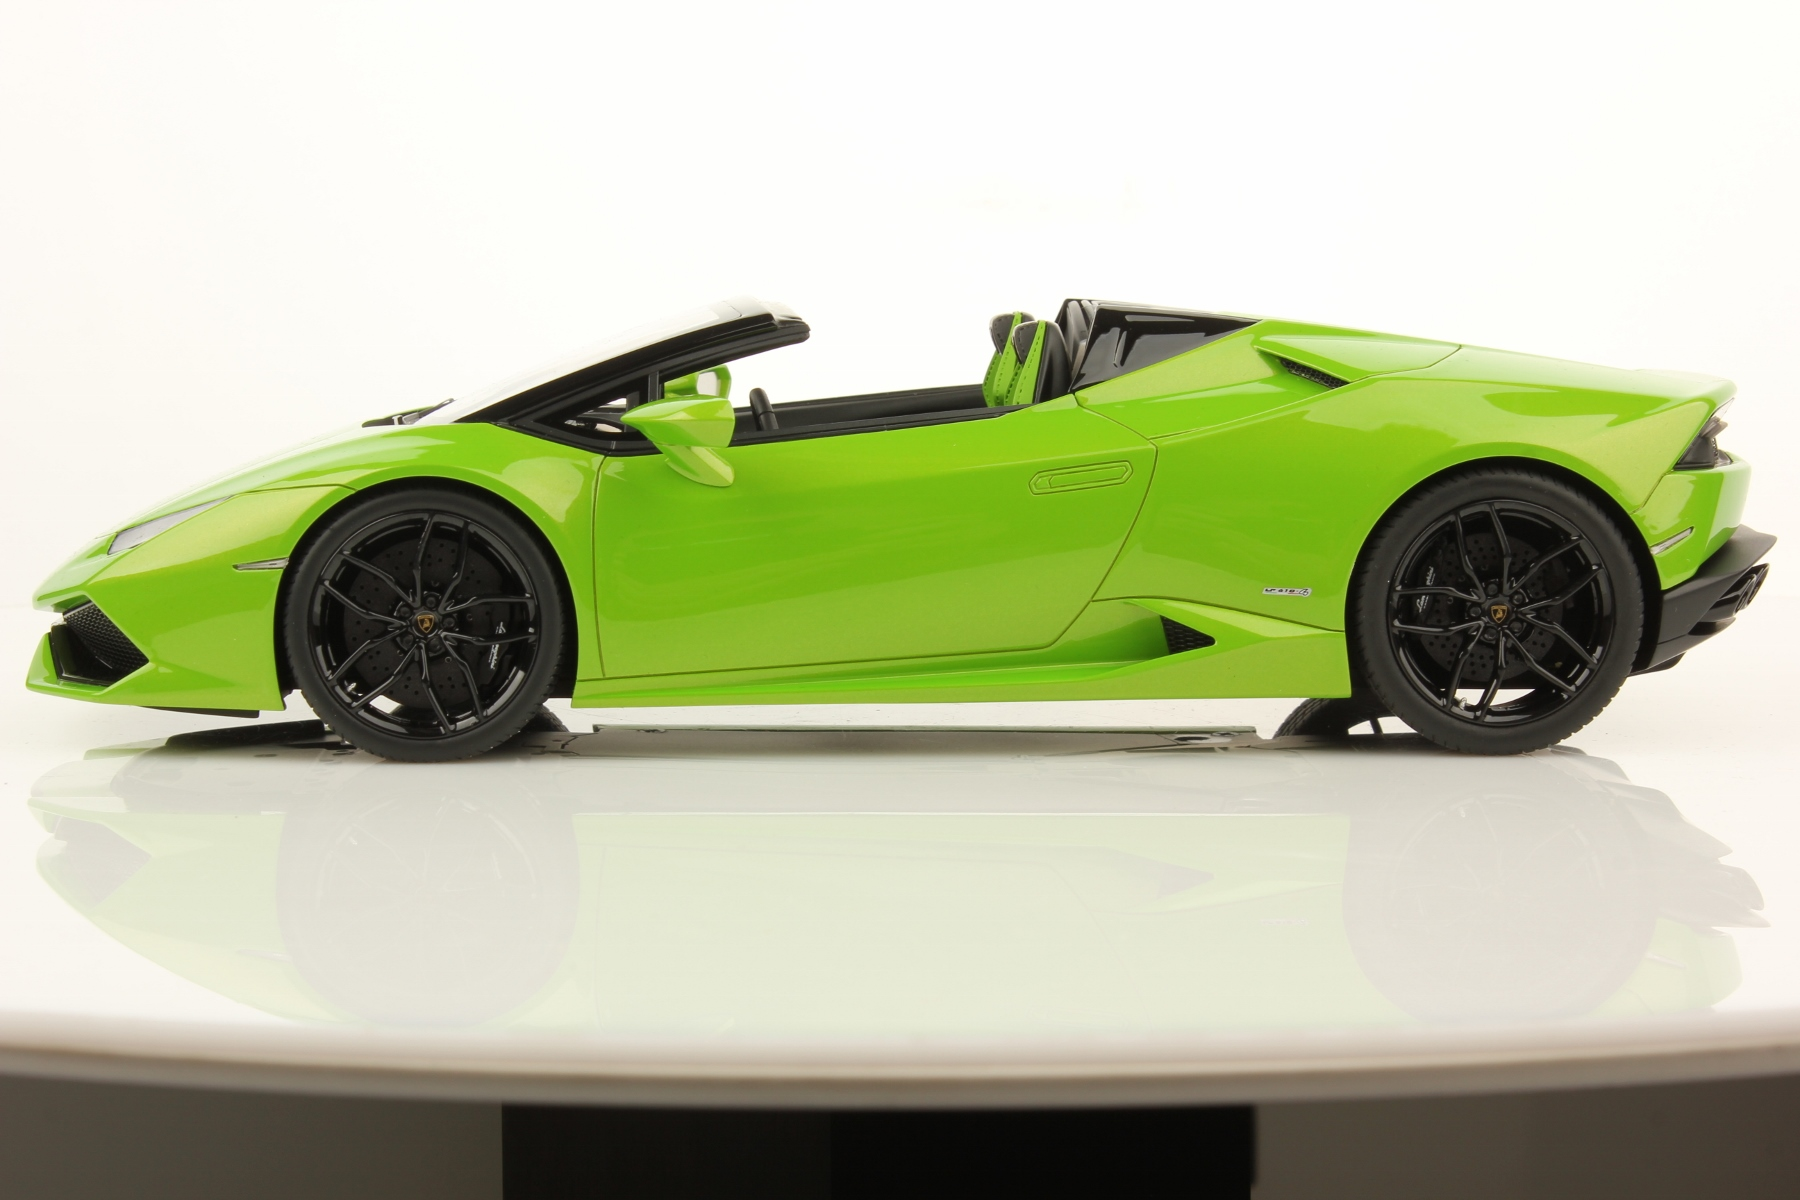 Lamborghini Huracan Lp 610 4 Spyder 1 18 Mr Collection